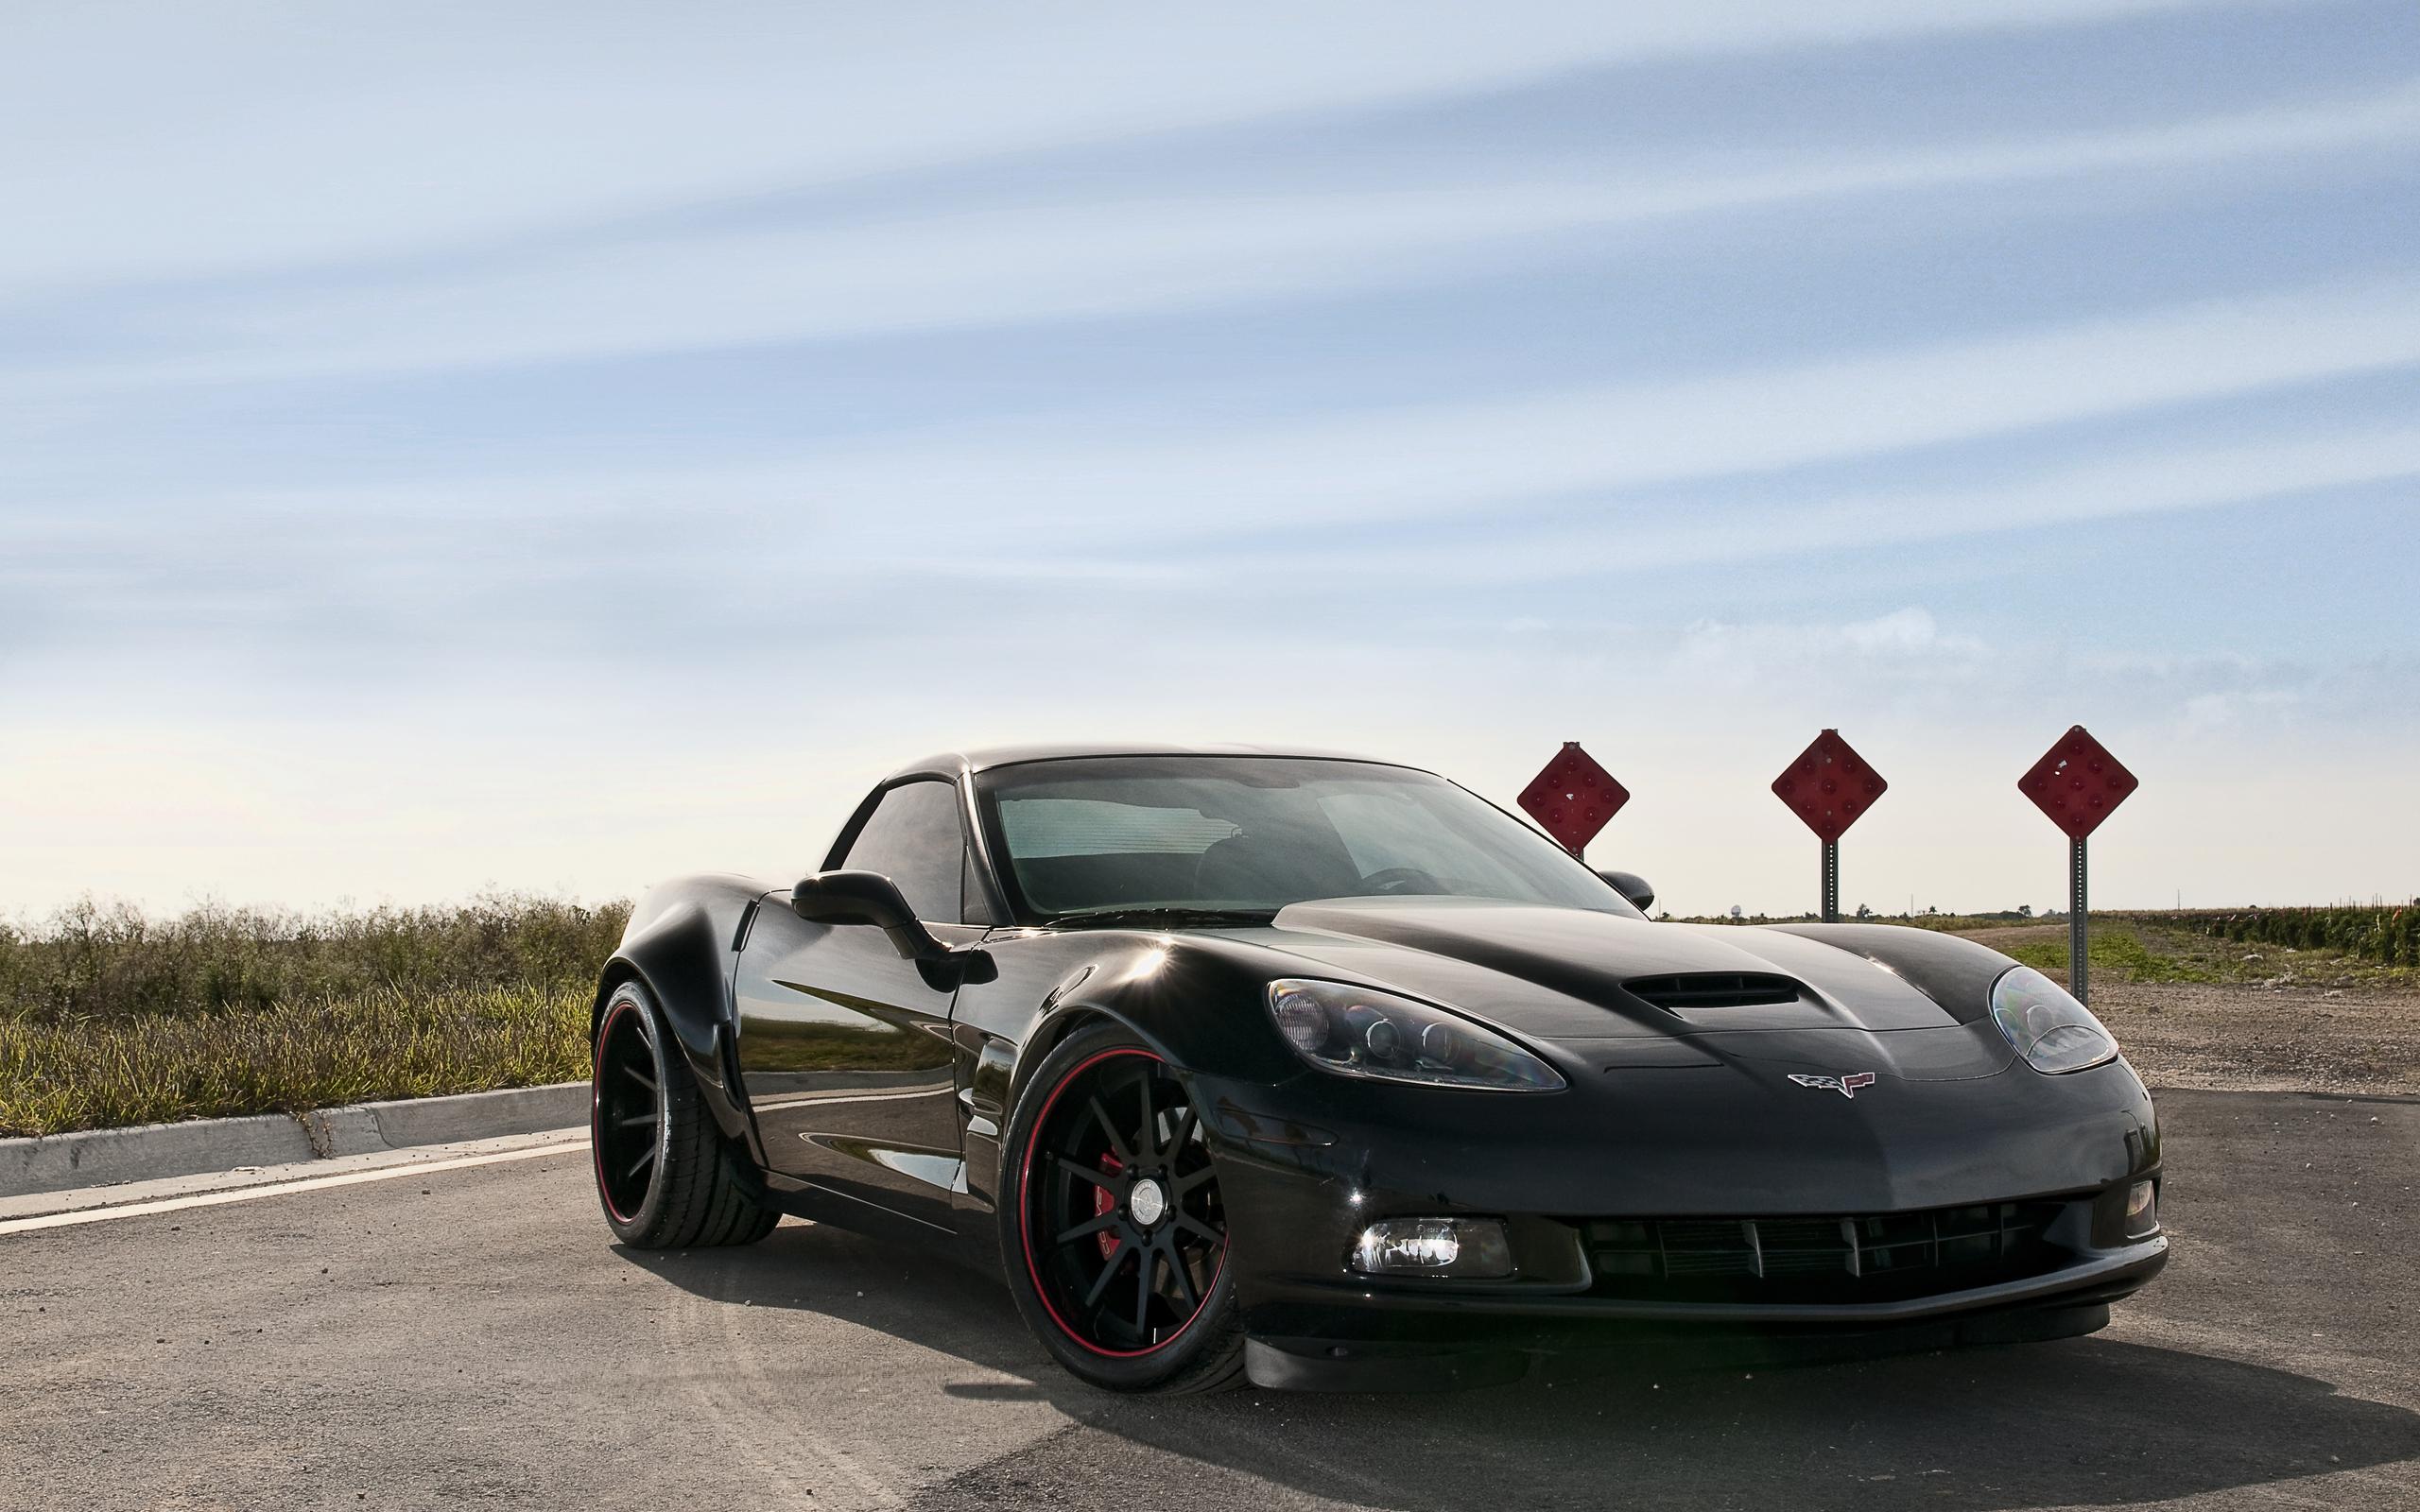 Corvette Hd Wallpaper Background Image 2560x1600 Id 205114